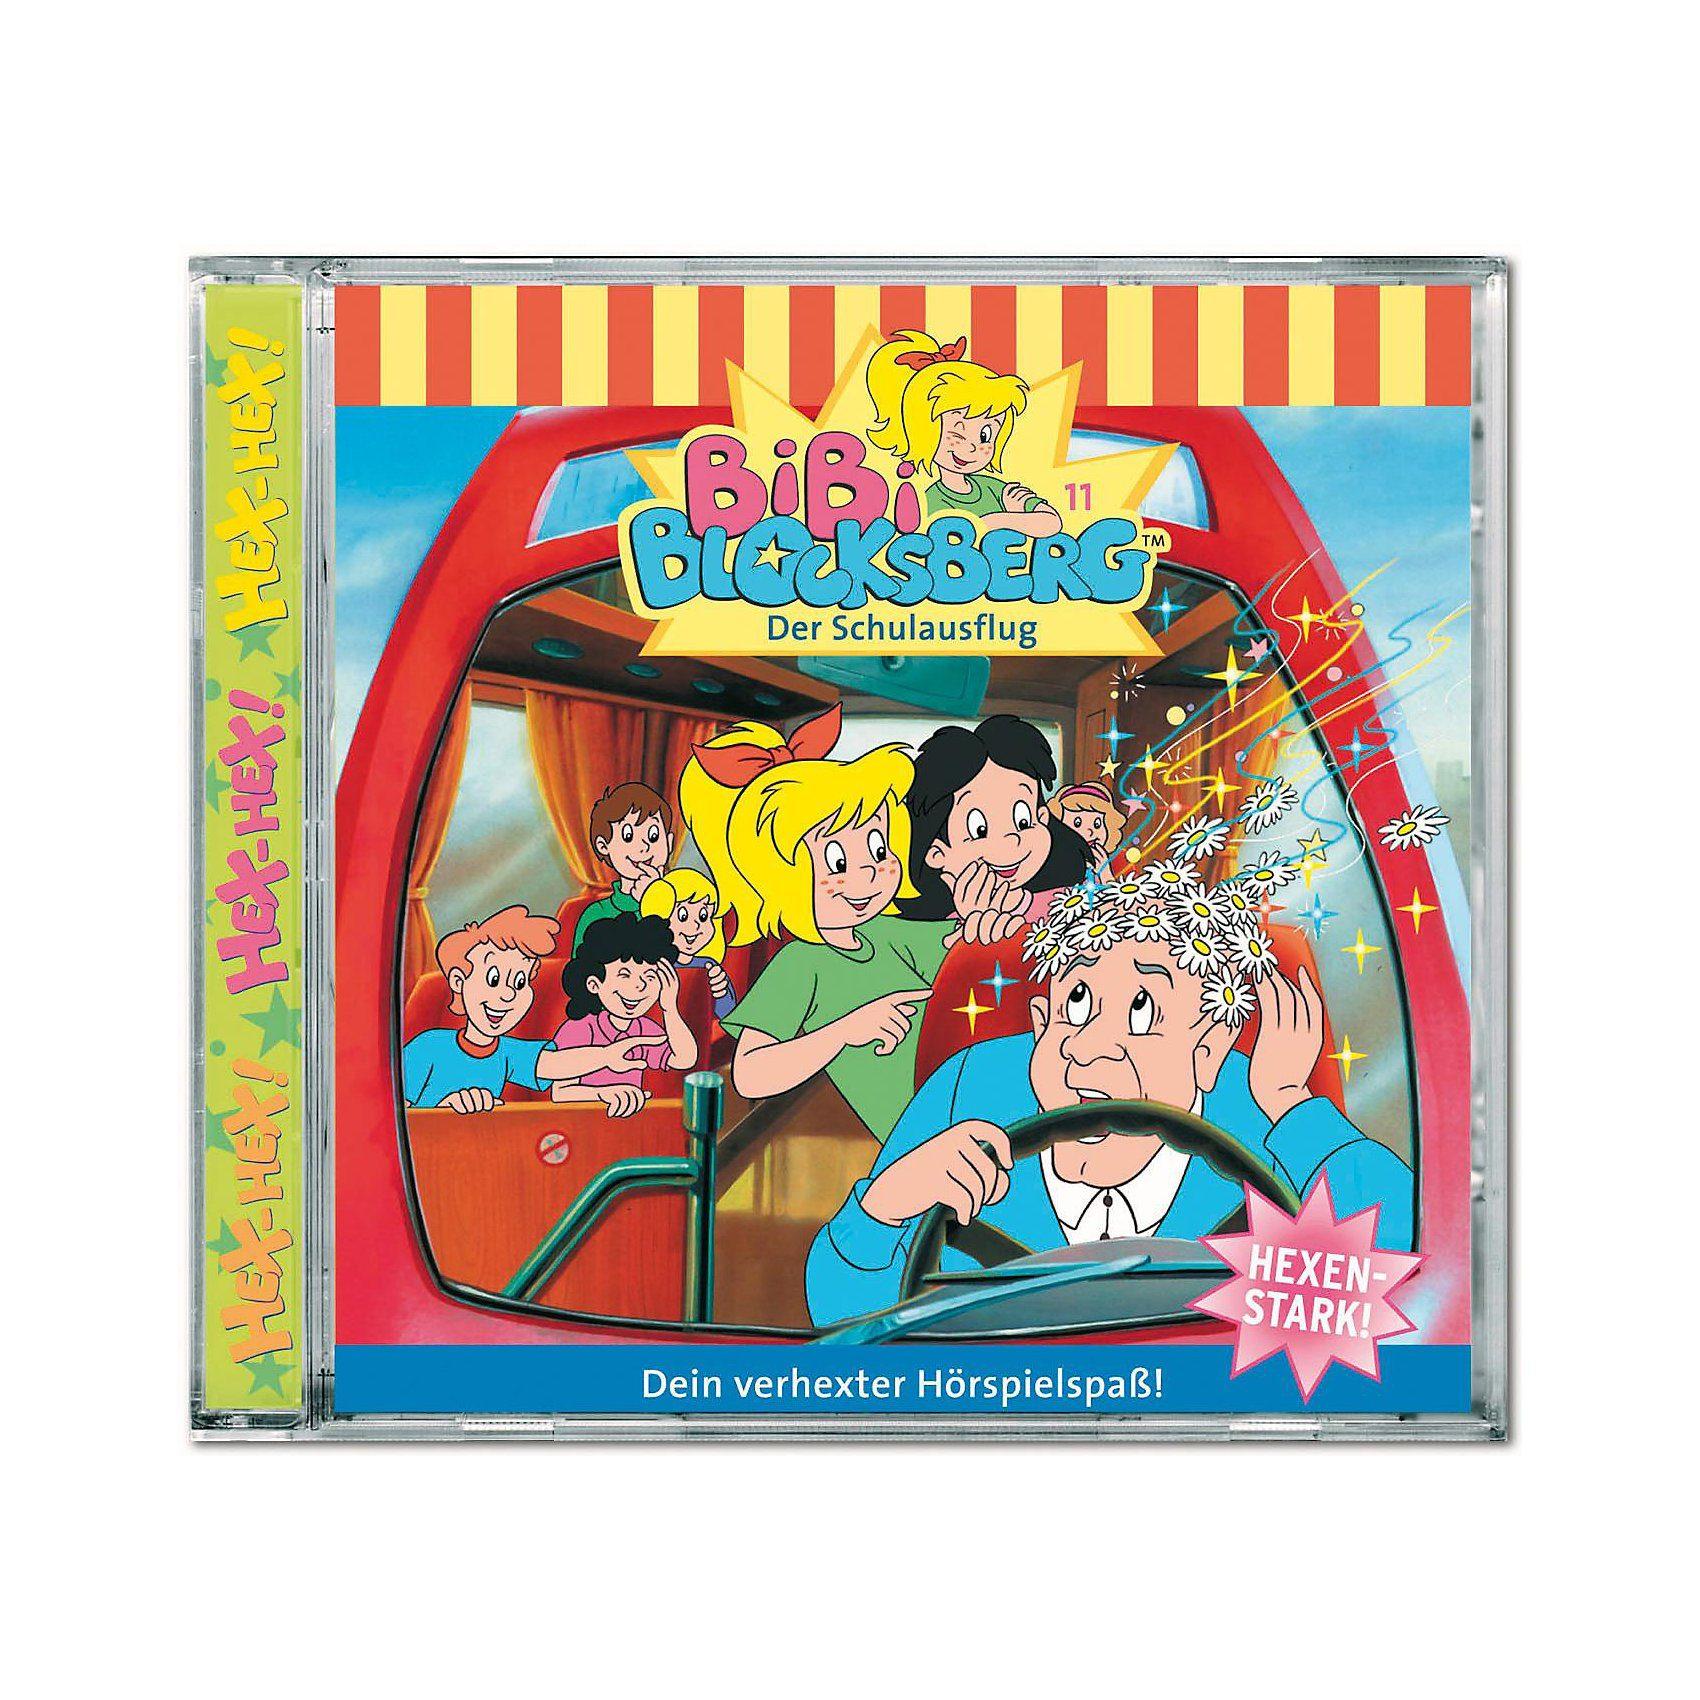 Kiddinx CD Bibi Blocksberg 11: Der Schulausflug